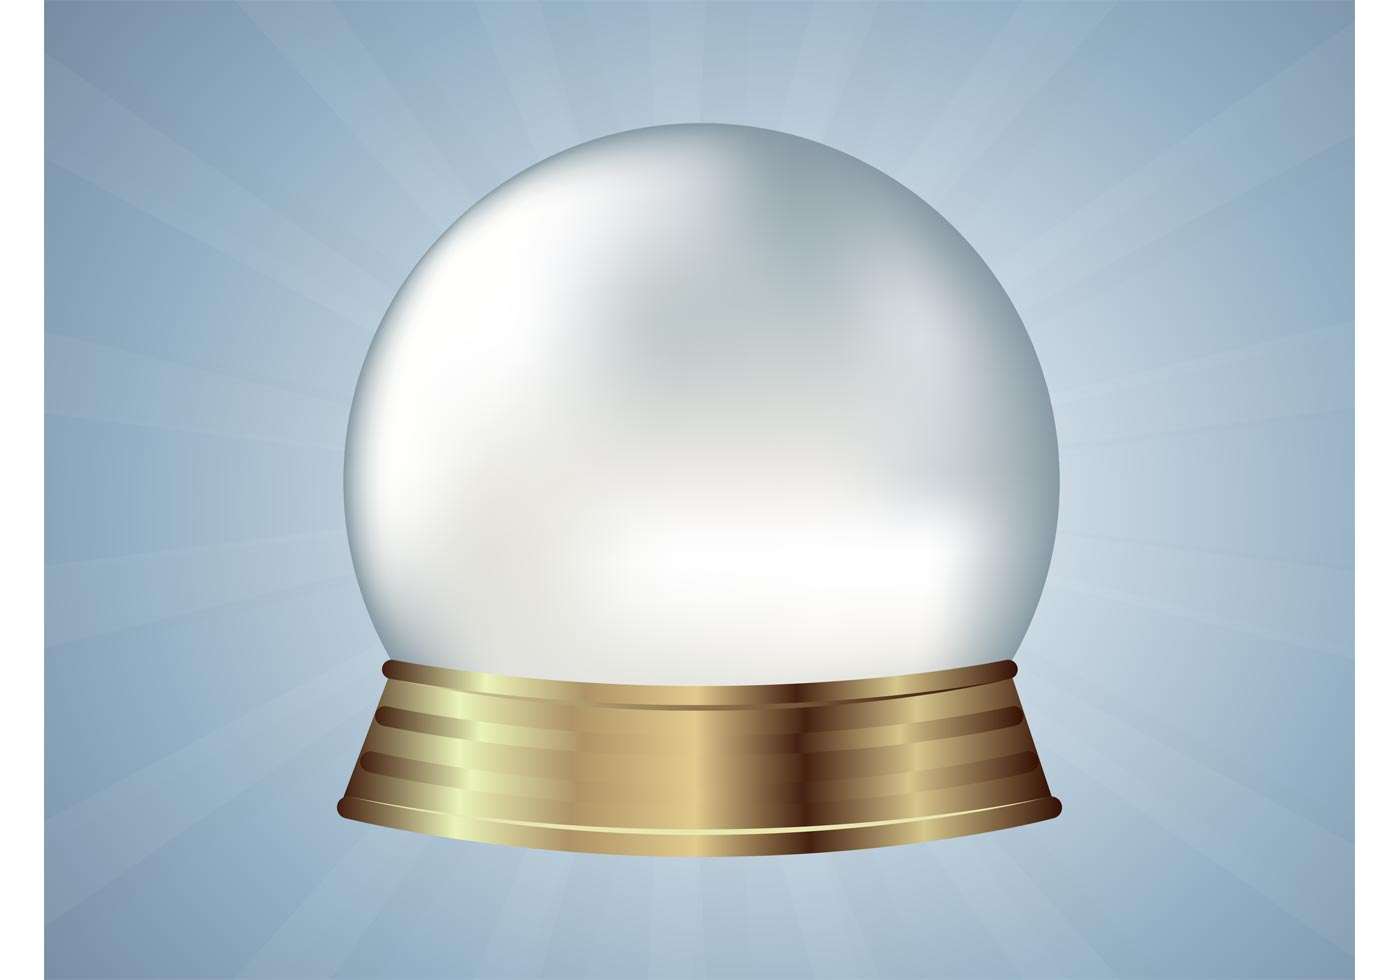 Crystal ball vector download free vector art stock - Ball image download ...